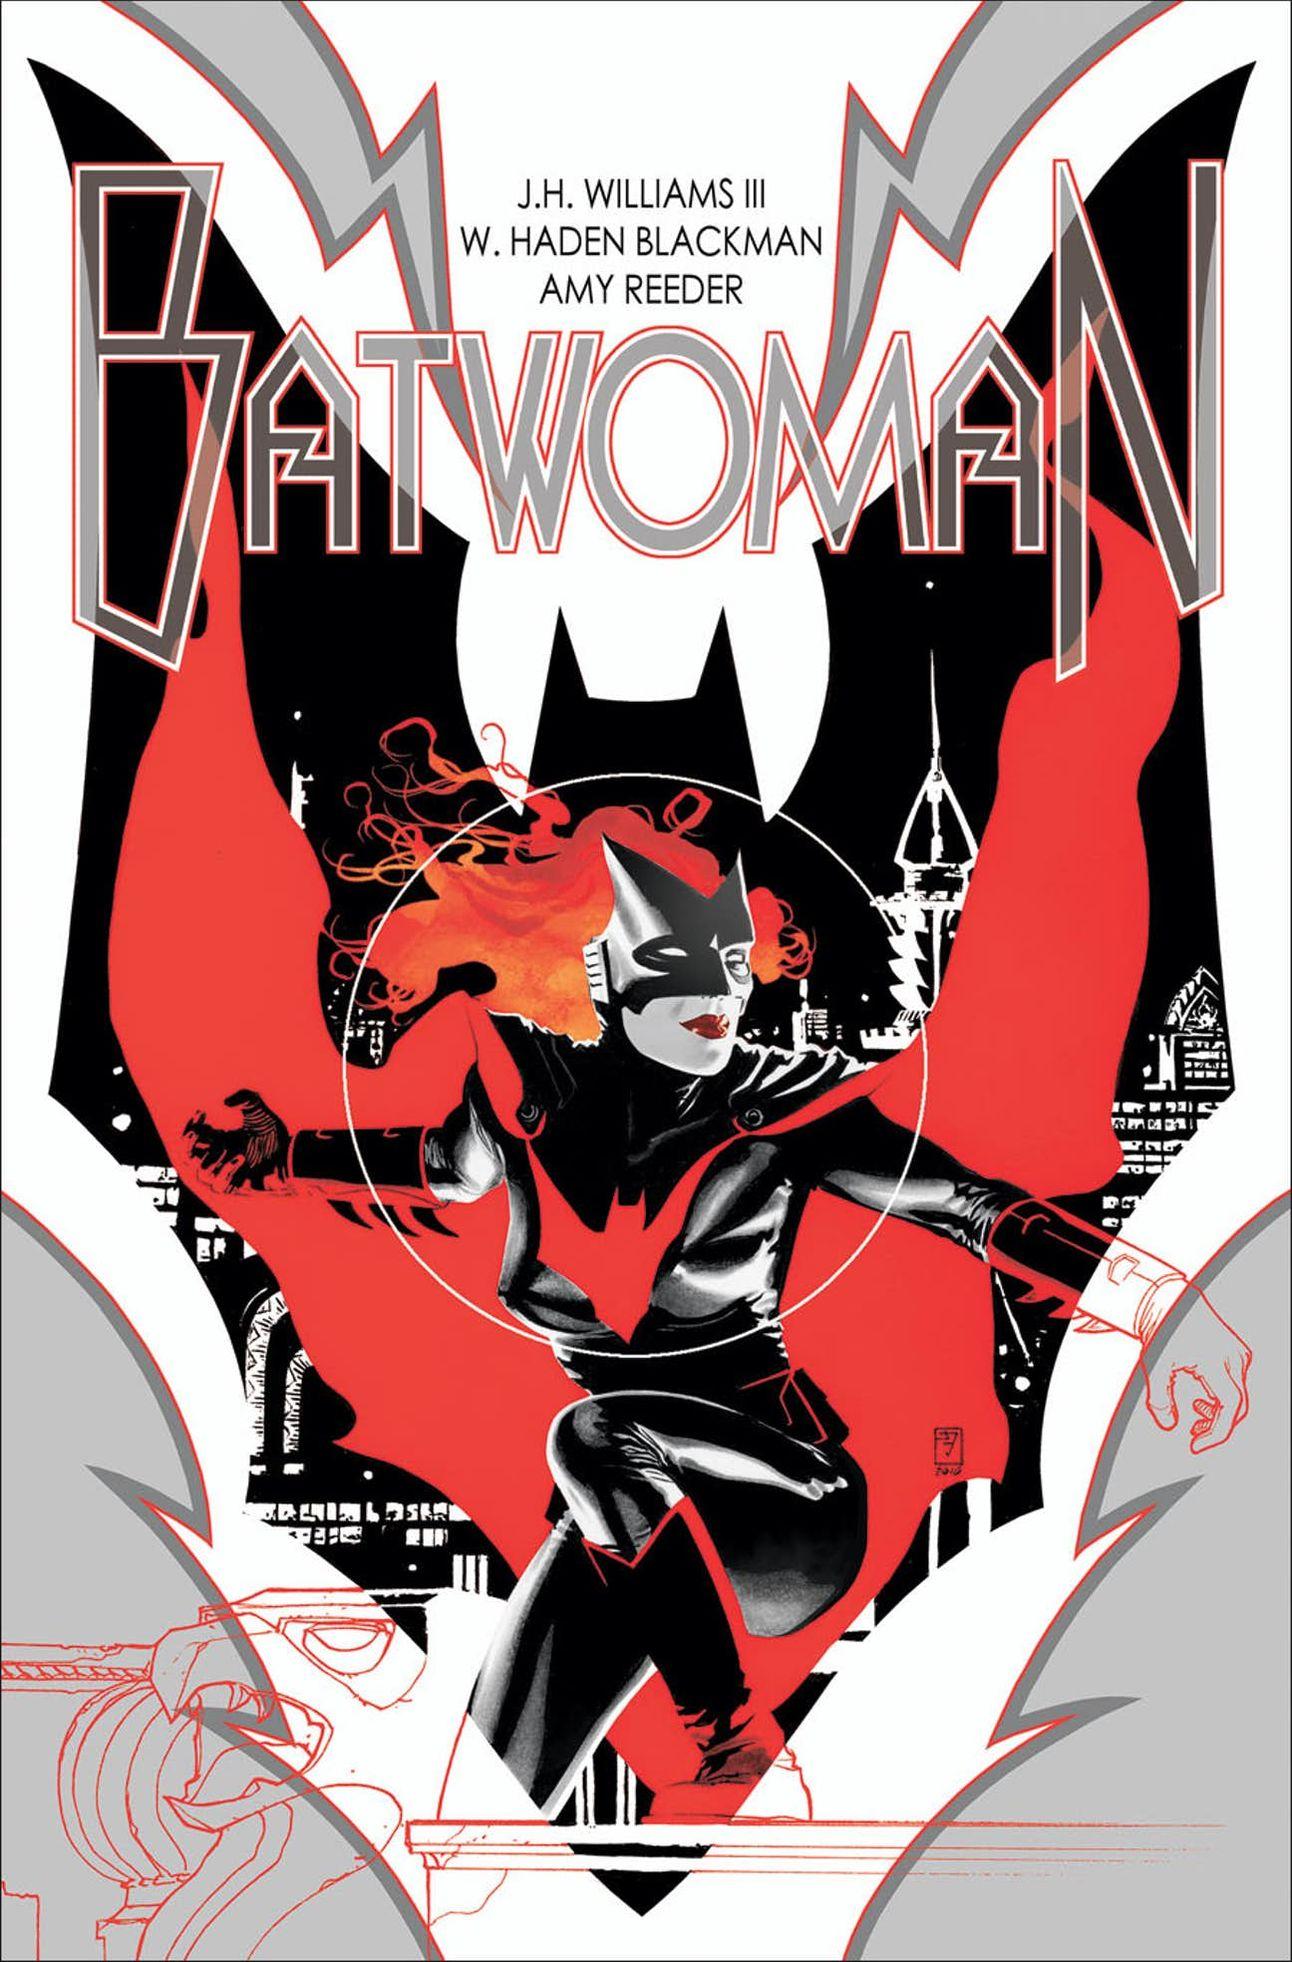 2010-batwoman-0.jpg